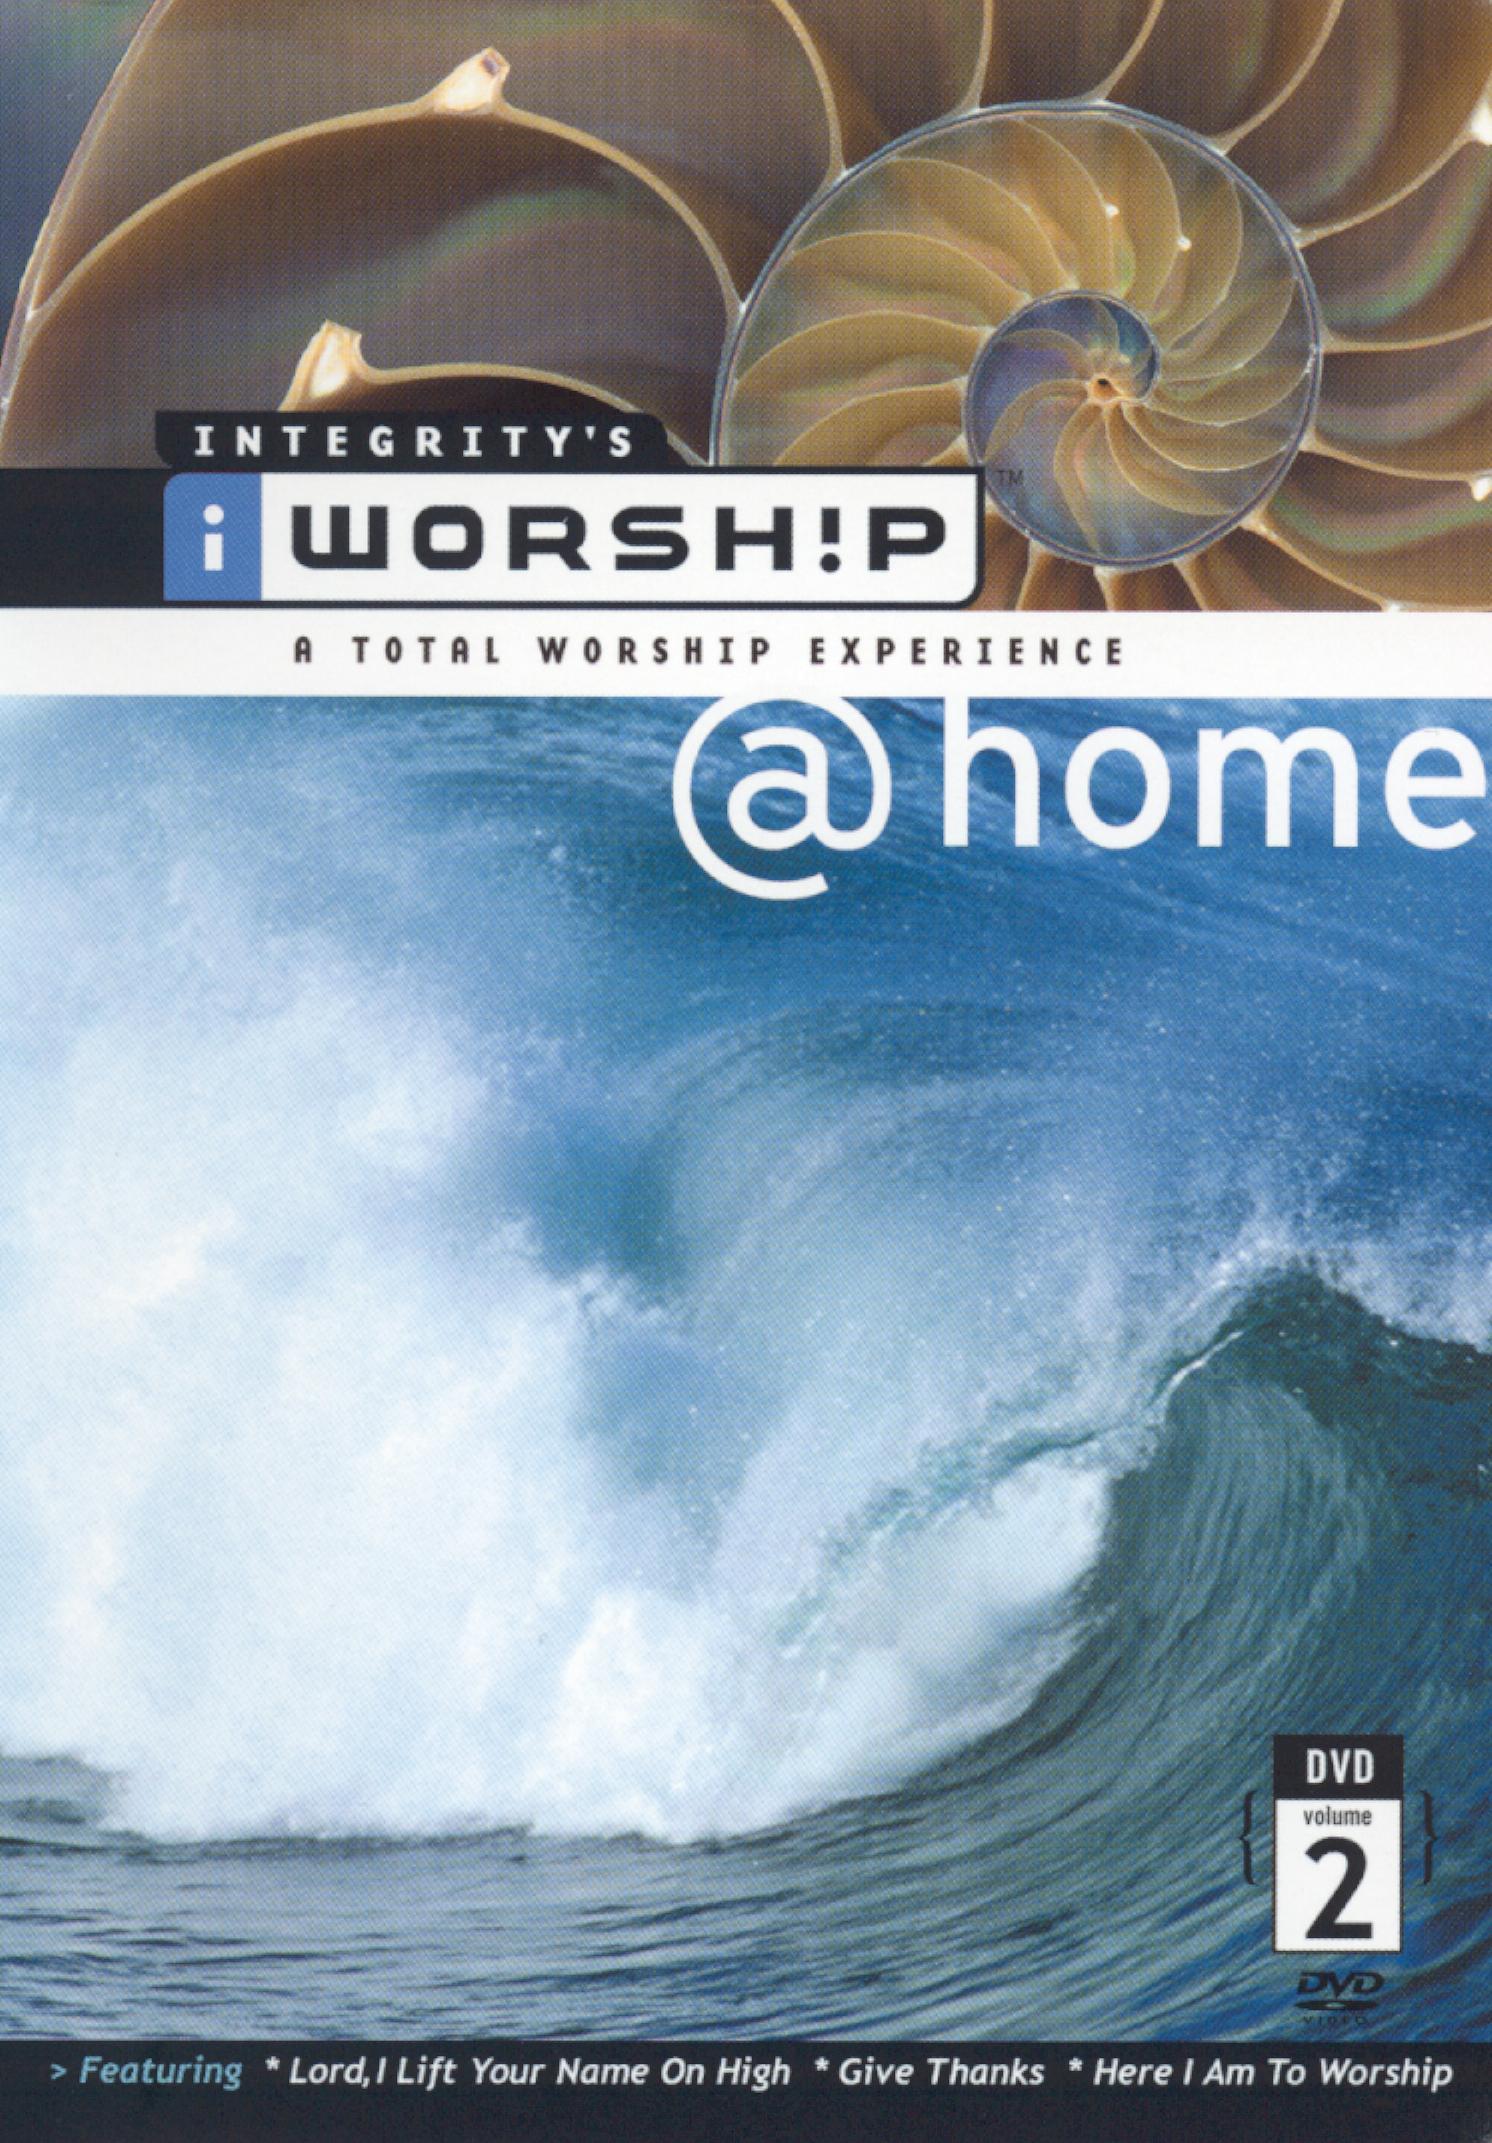 iWorship @ Home, Vol. 2